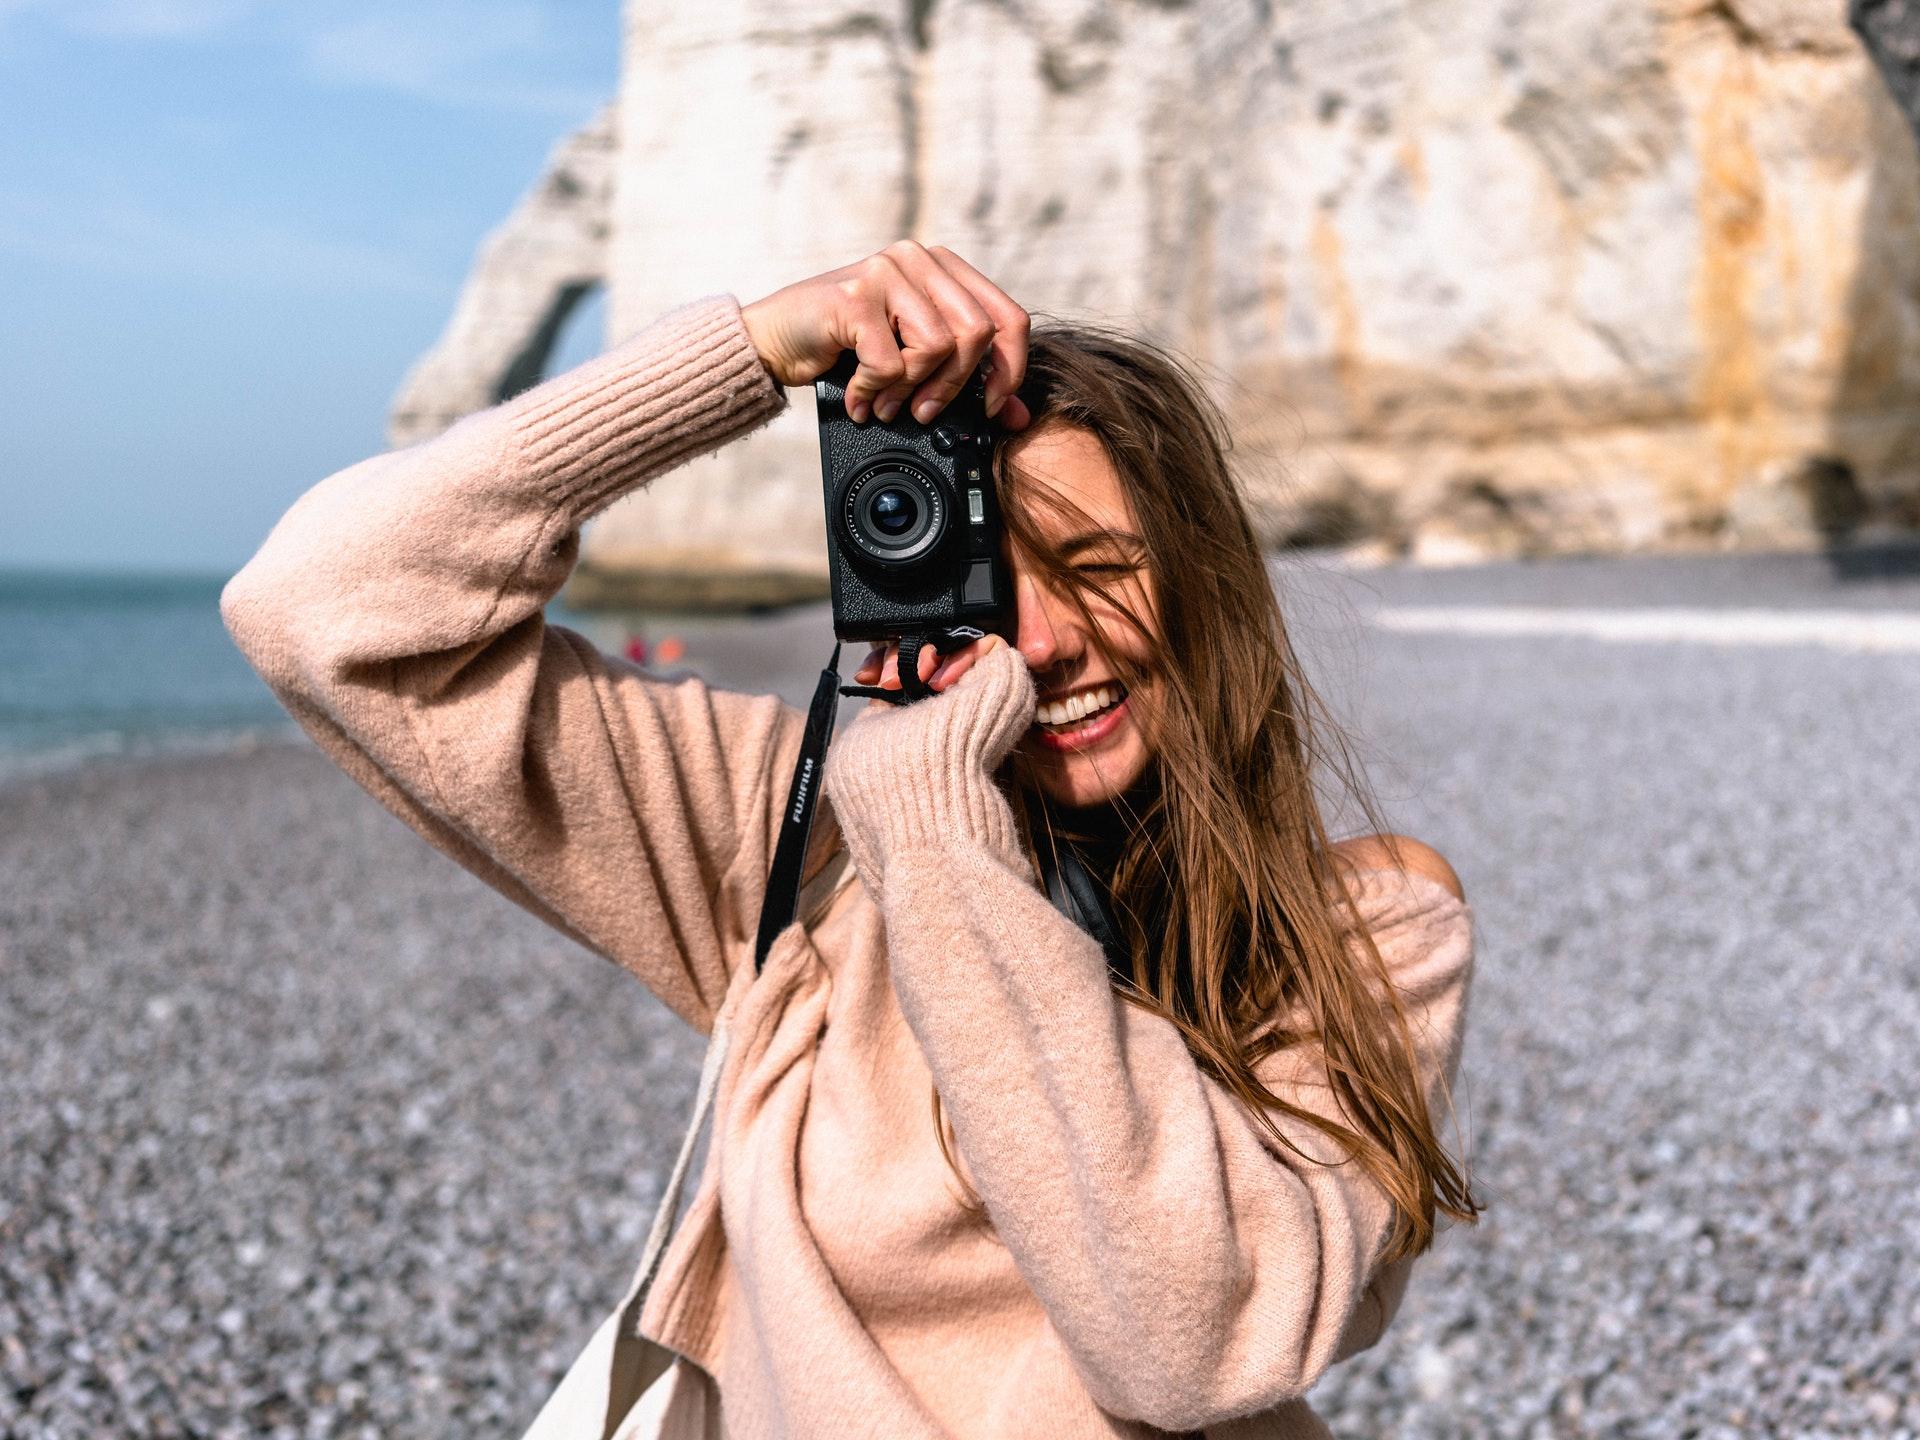 smiling woman on la jolla beach holding camera